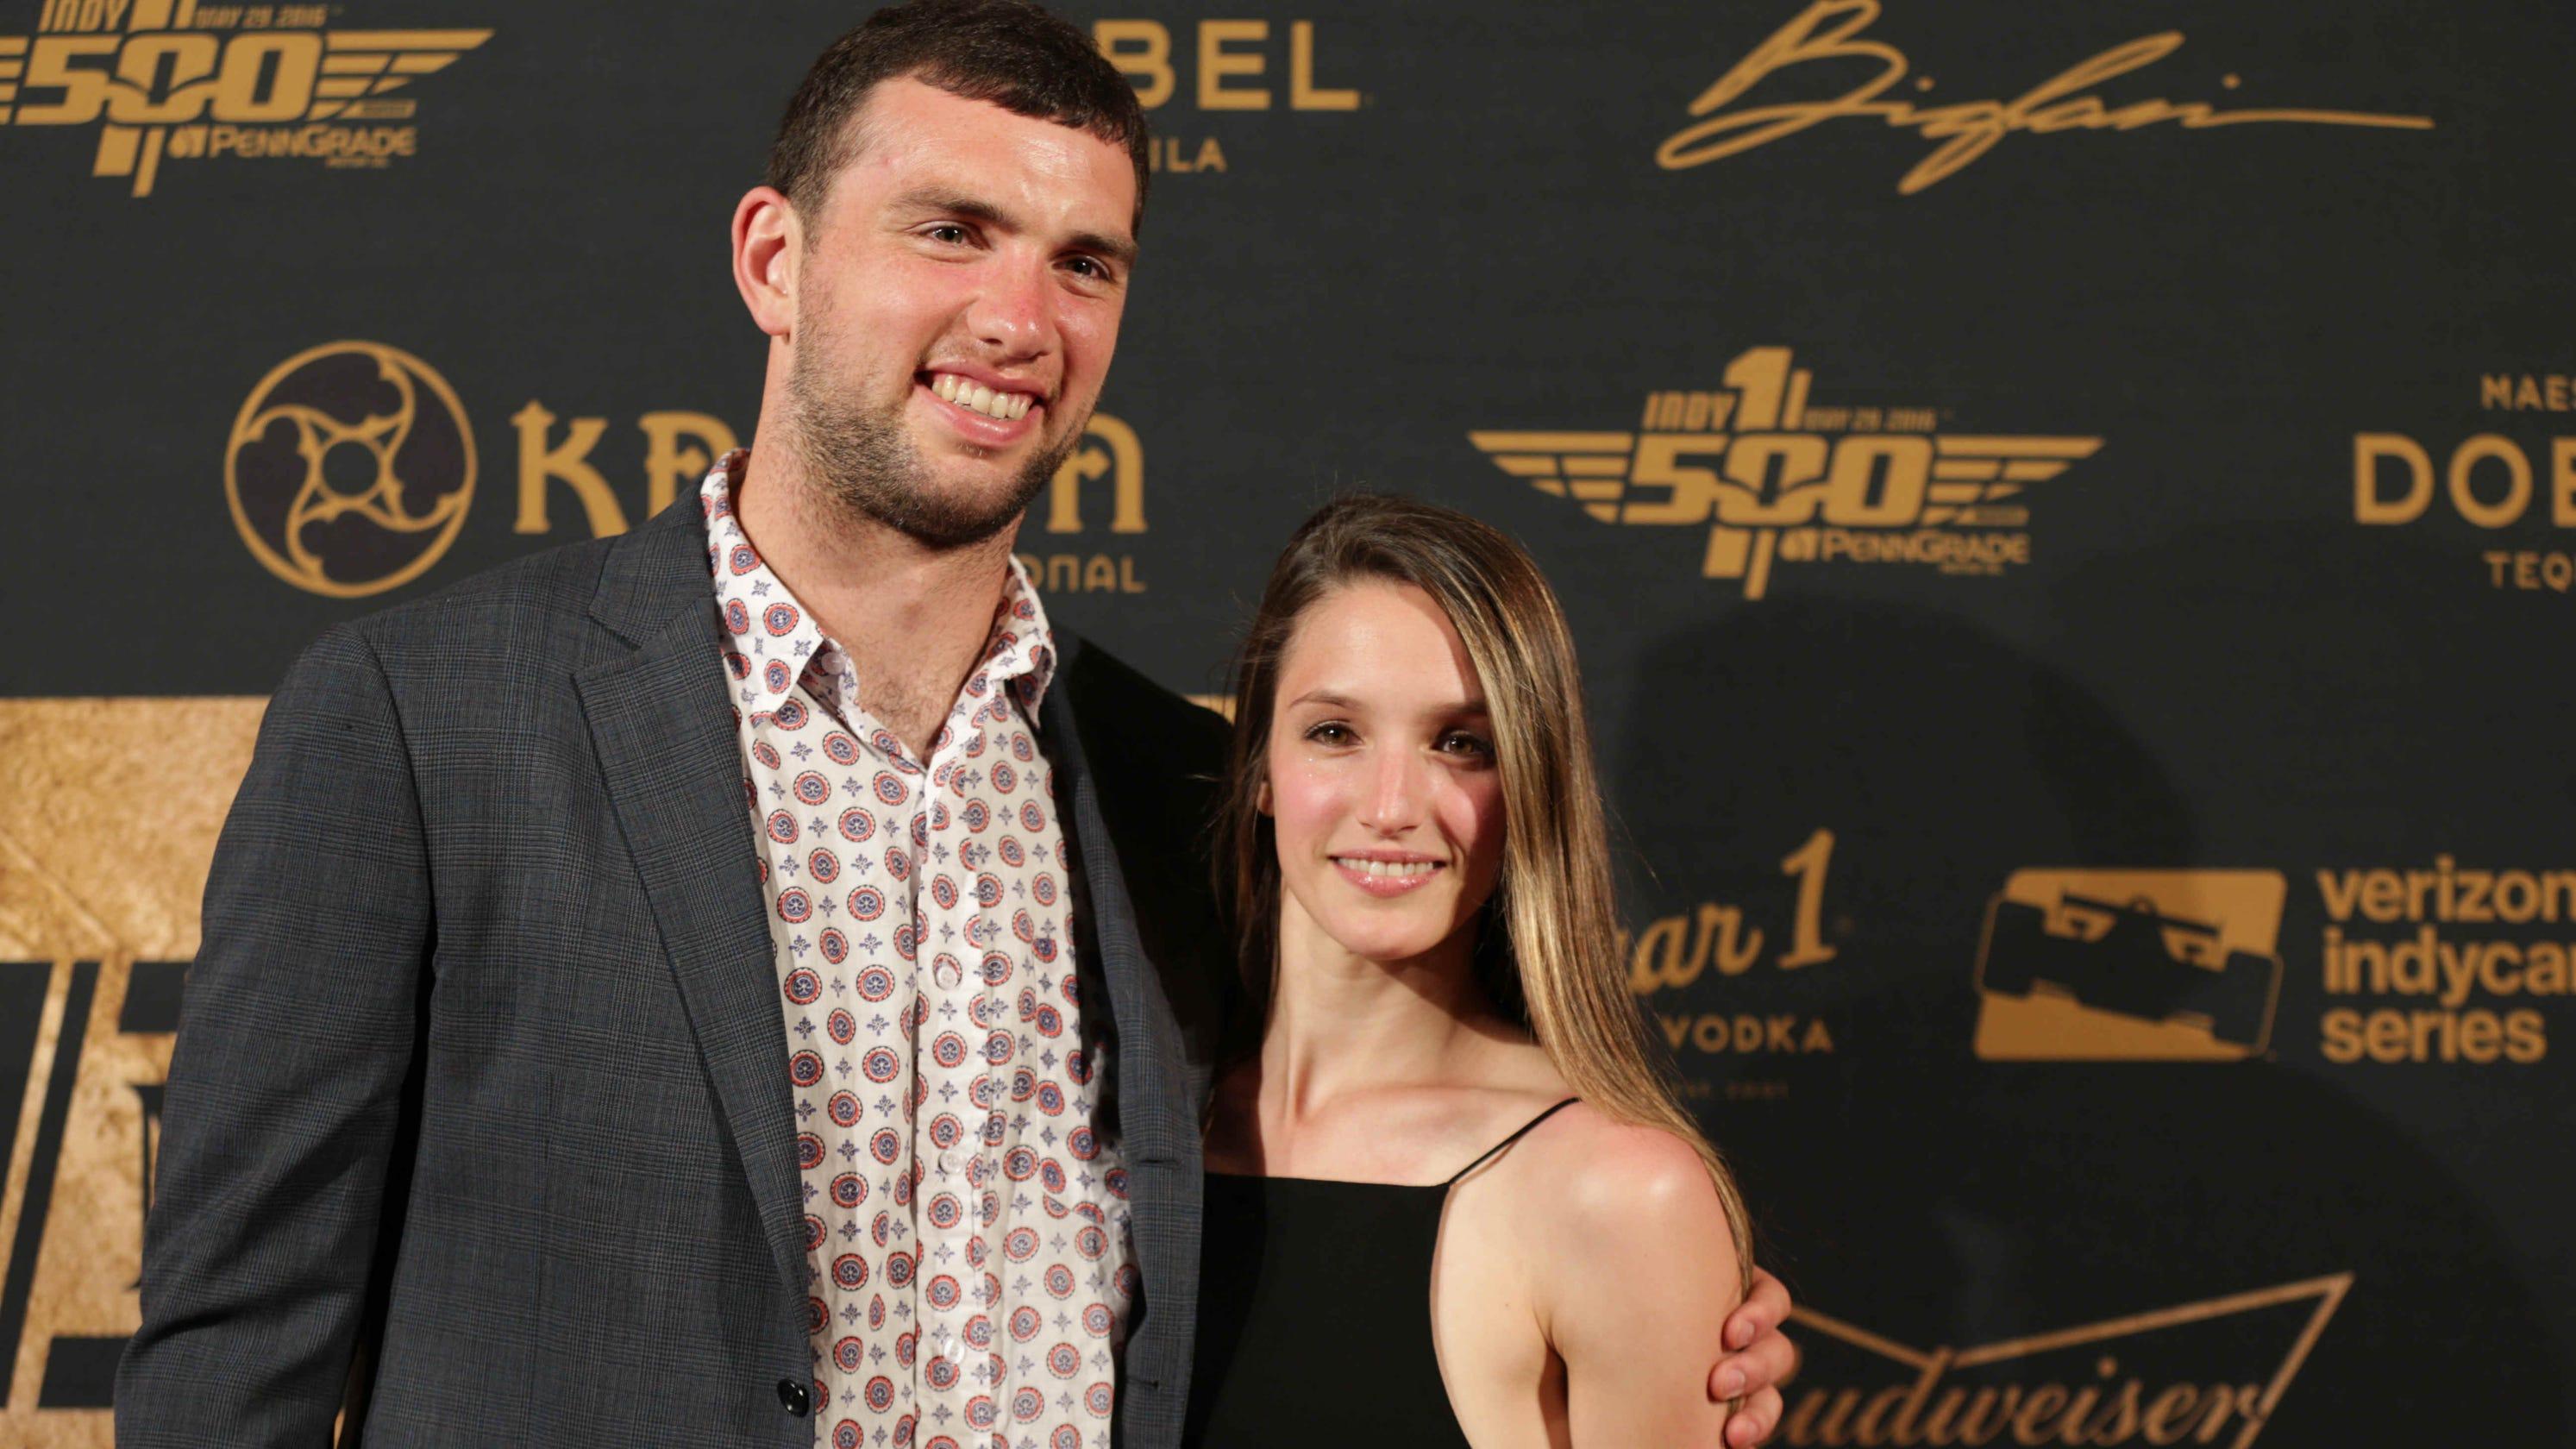 Andrew Luck wedding: Colts quarterback marries Nicole Pechanec